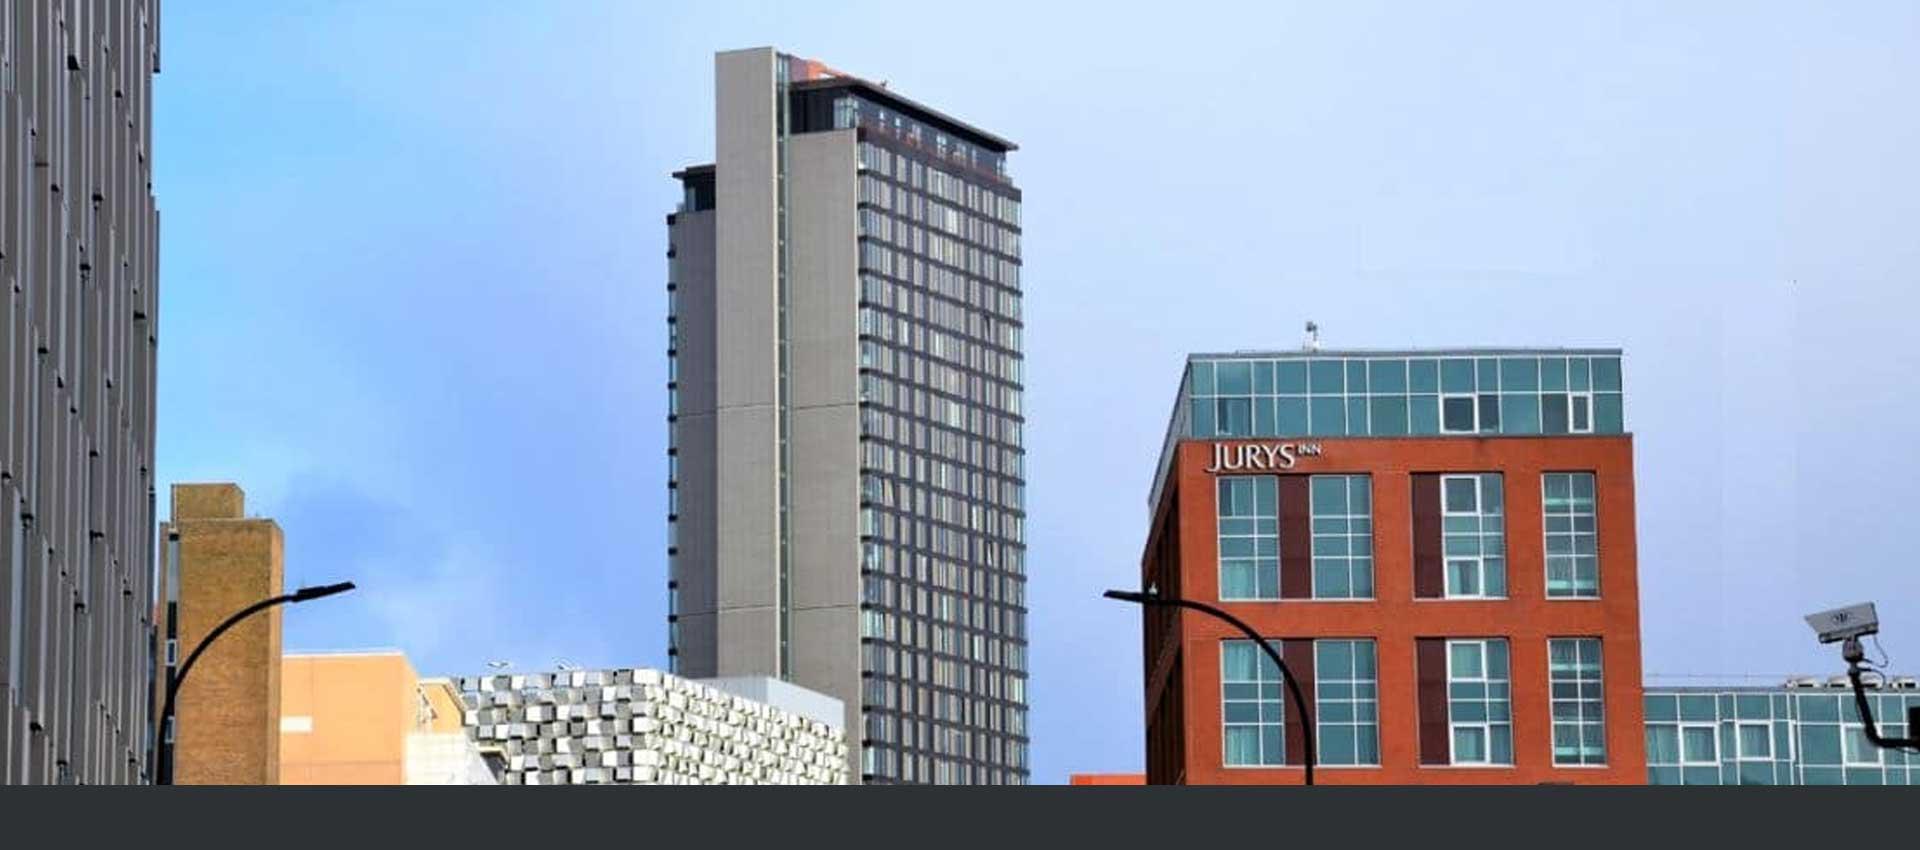 St Paul's City Lofts, Sheffield - Energicity